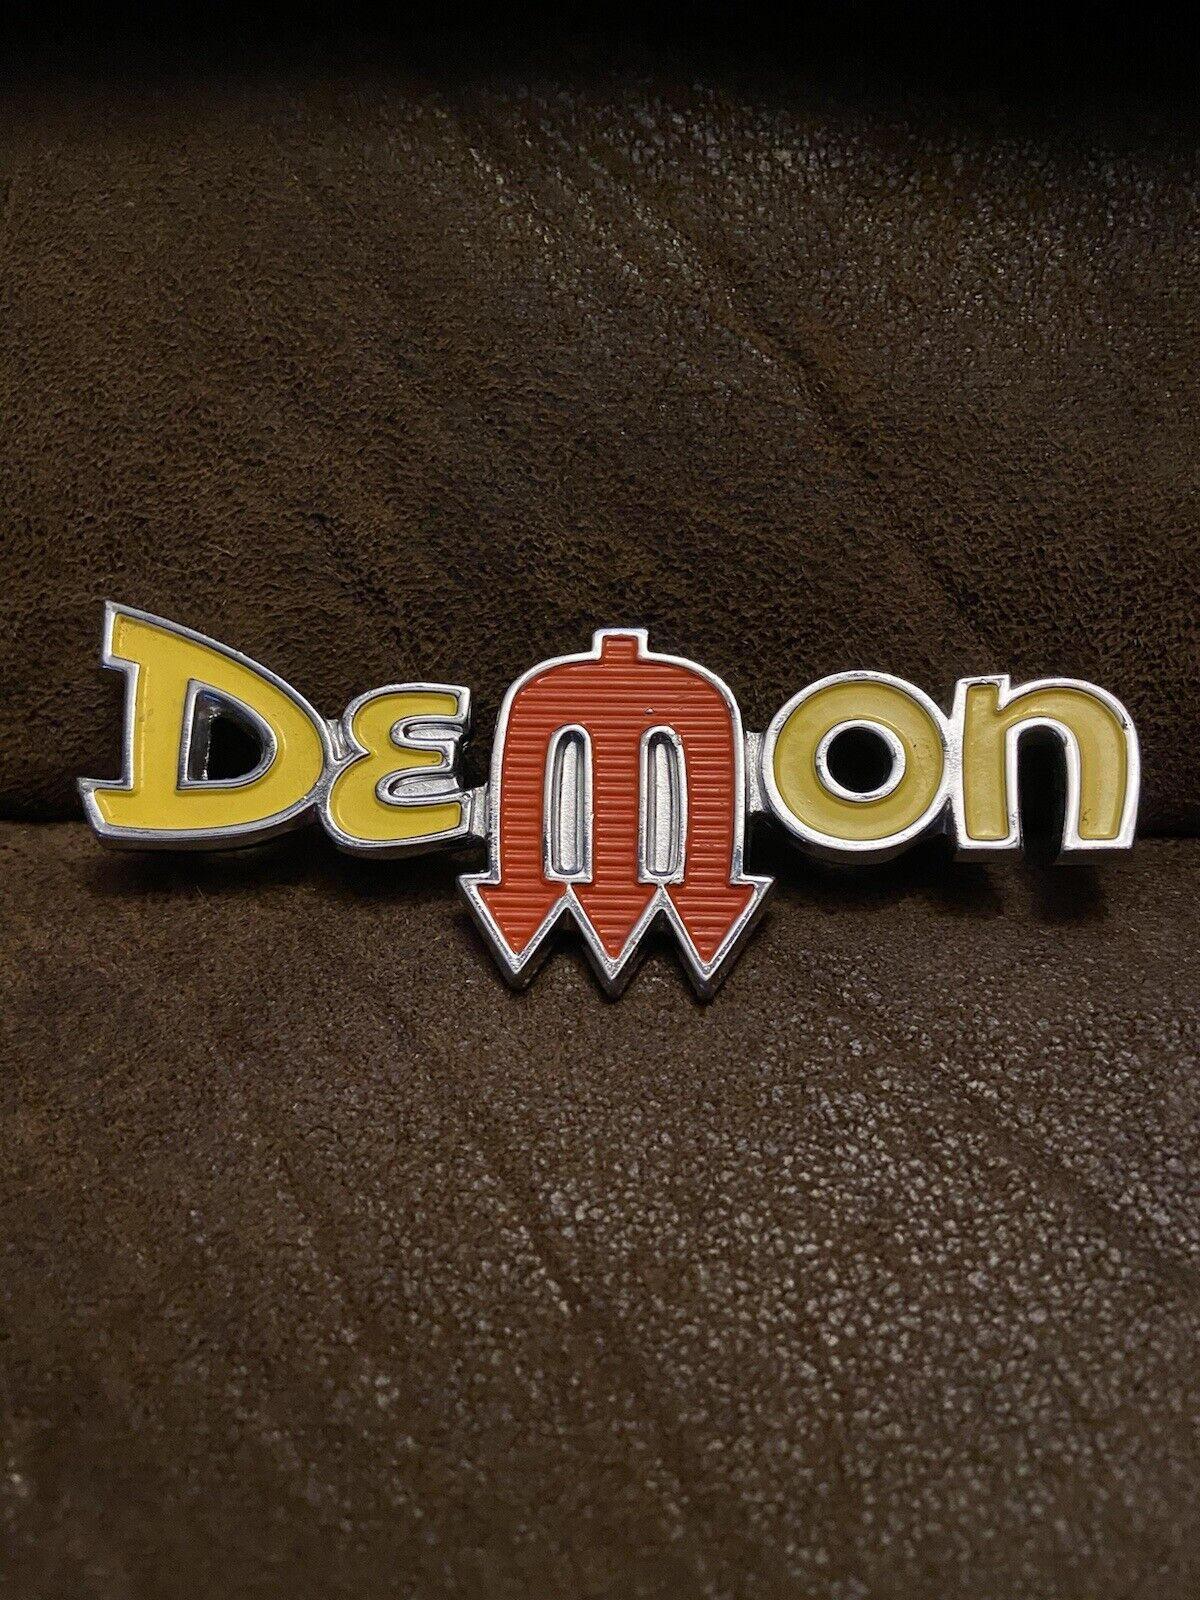 NEW Mopar 1972 Demon Fender Emblem